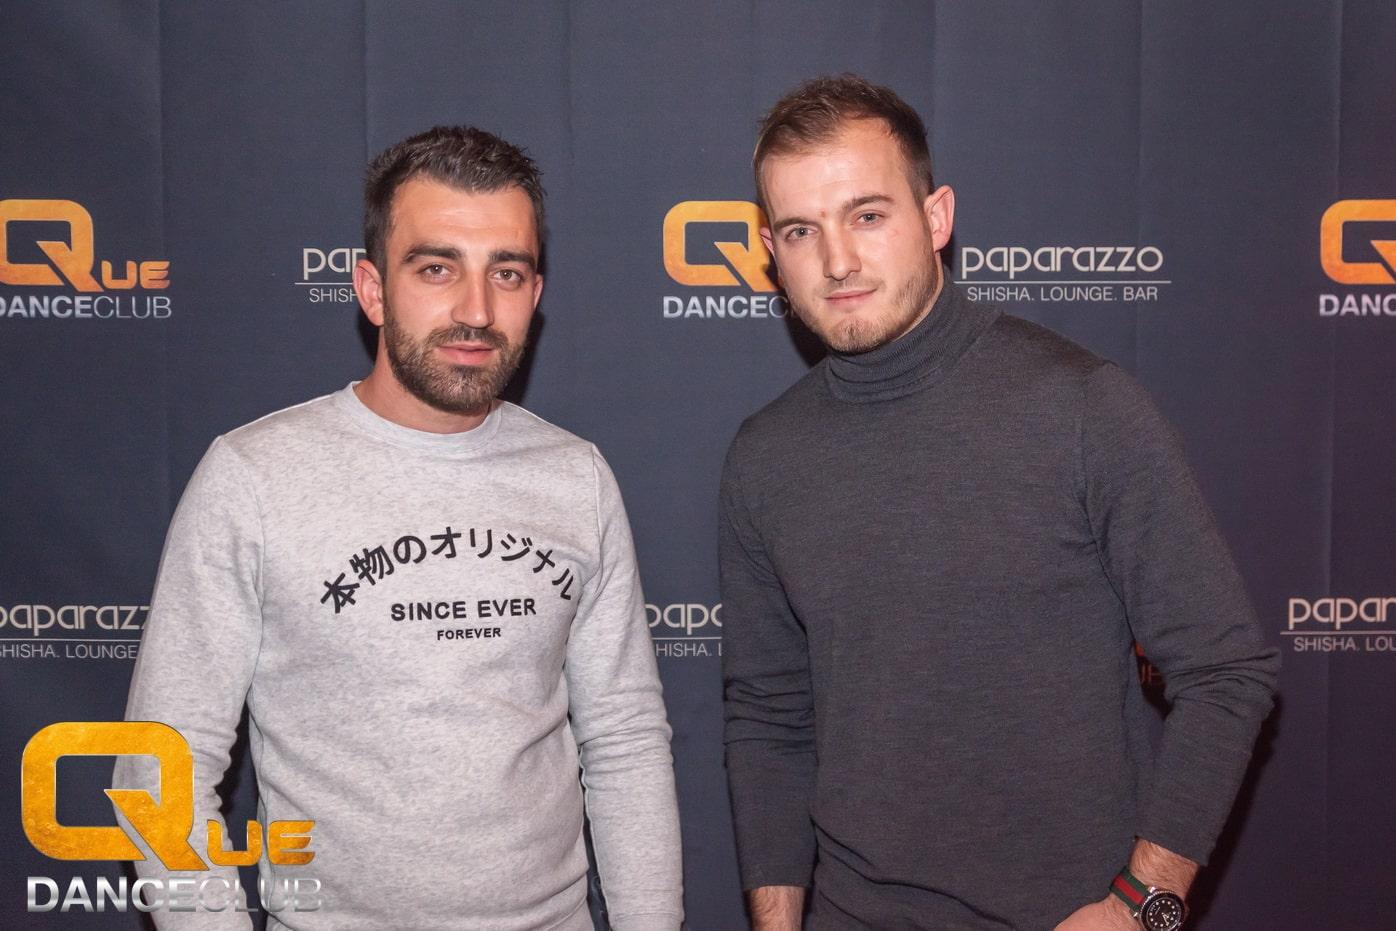 2018_12_08_Que_Danceclub_Paparazzo_Night_Ardian_Bujupi_Live_Nightlife_Scene_Timo_016